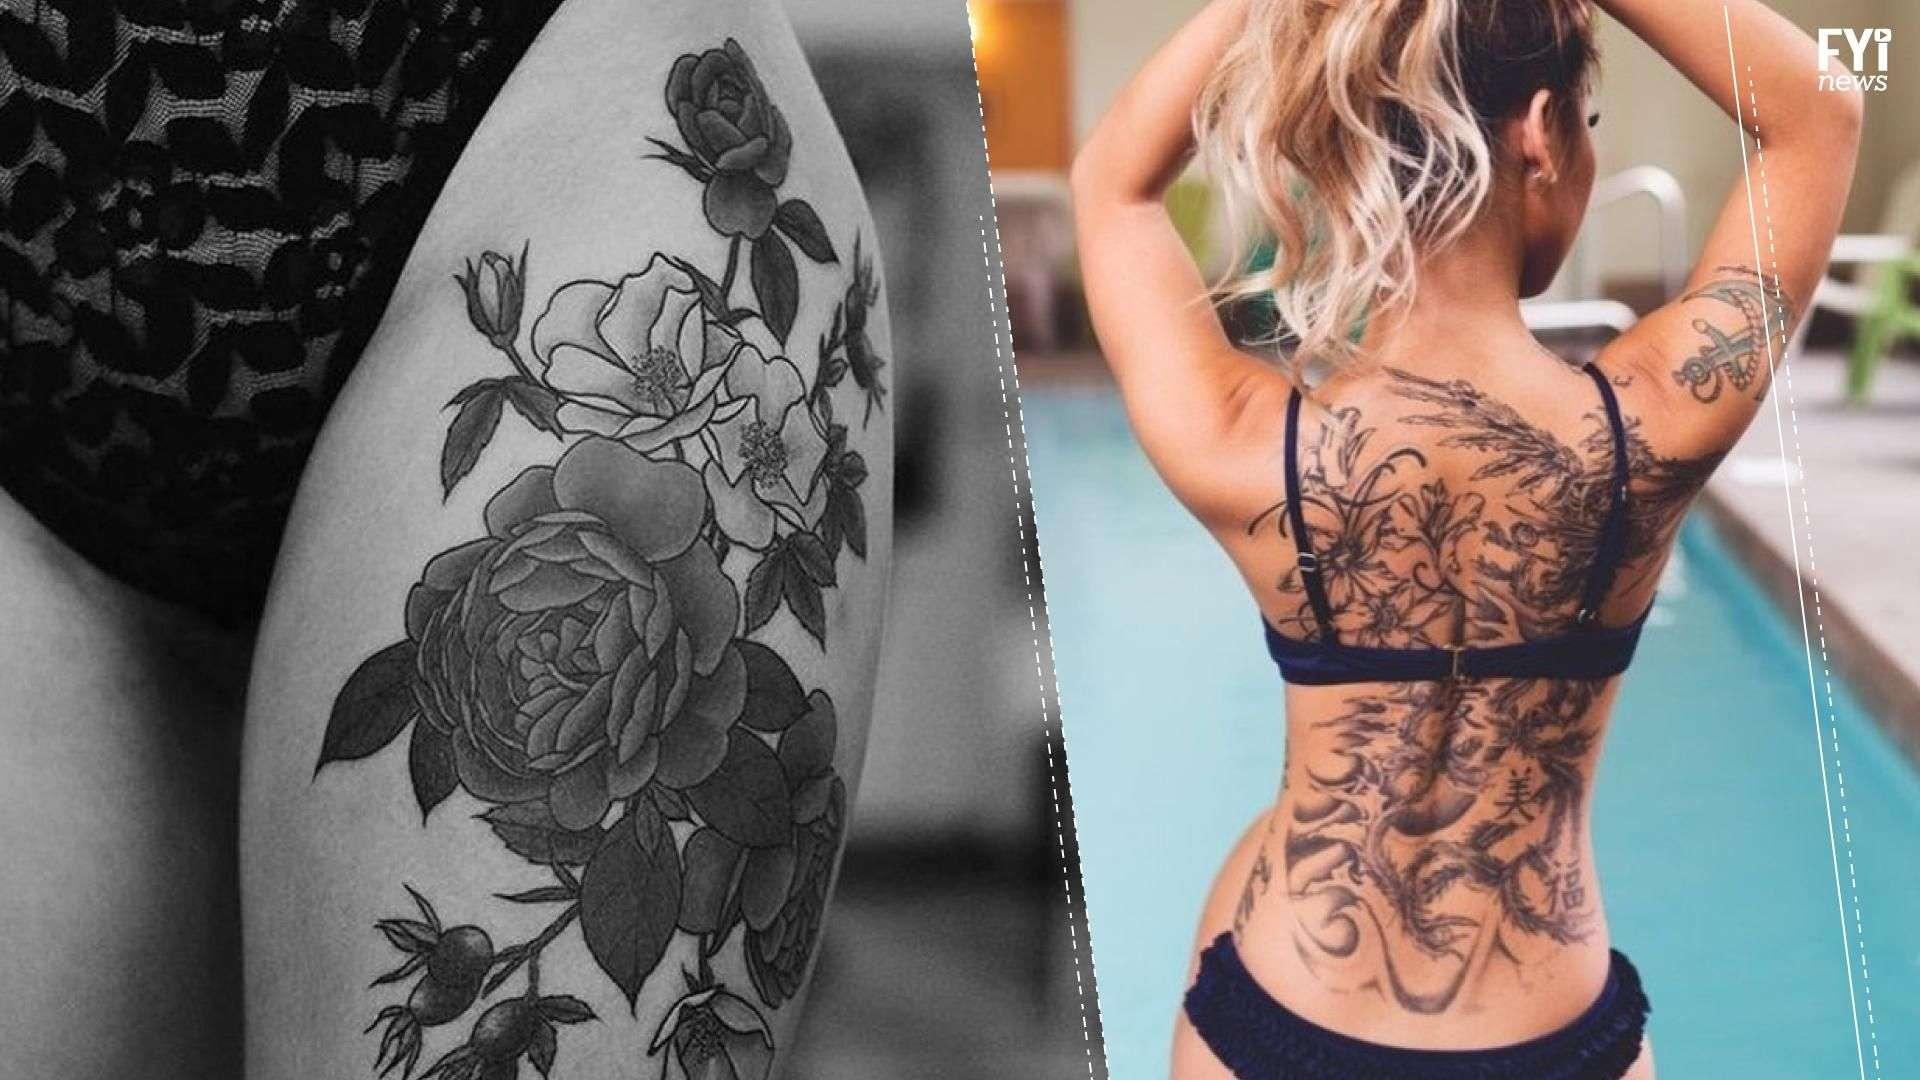 Los tatuajes son su esperanza